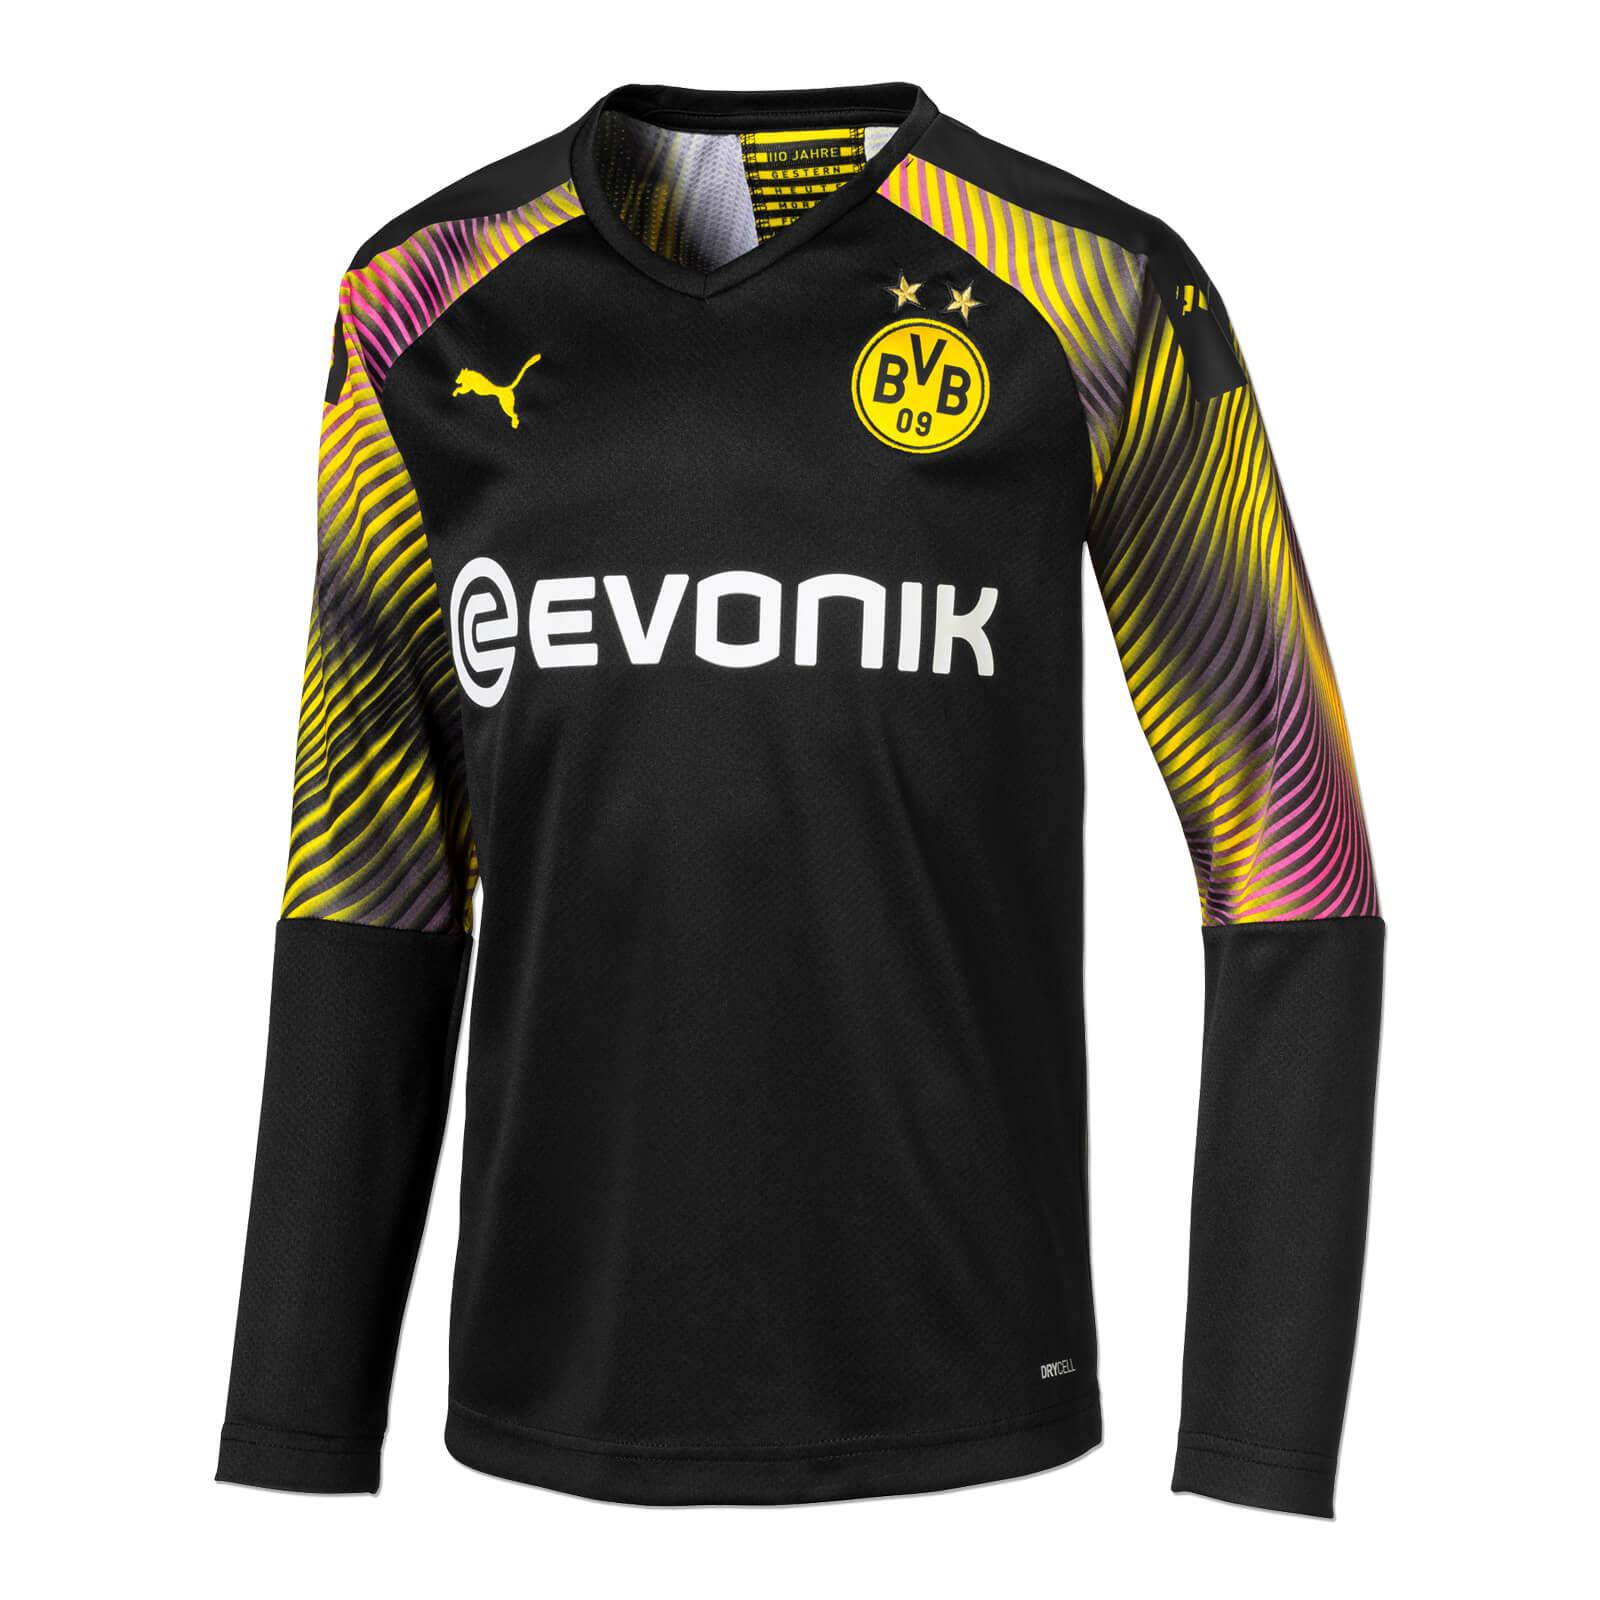 Borussia Dortmund Kinder Torwart Trikot 2019 20 schwarz